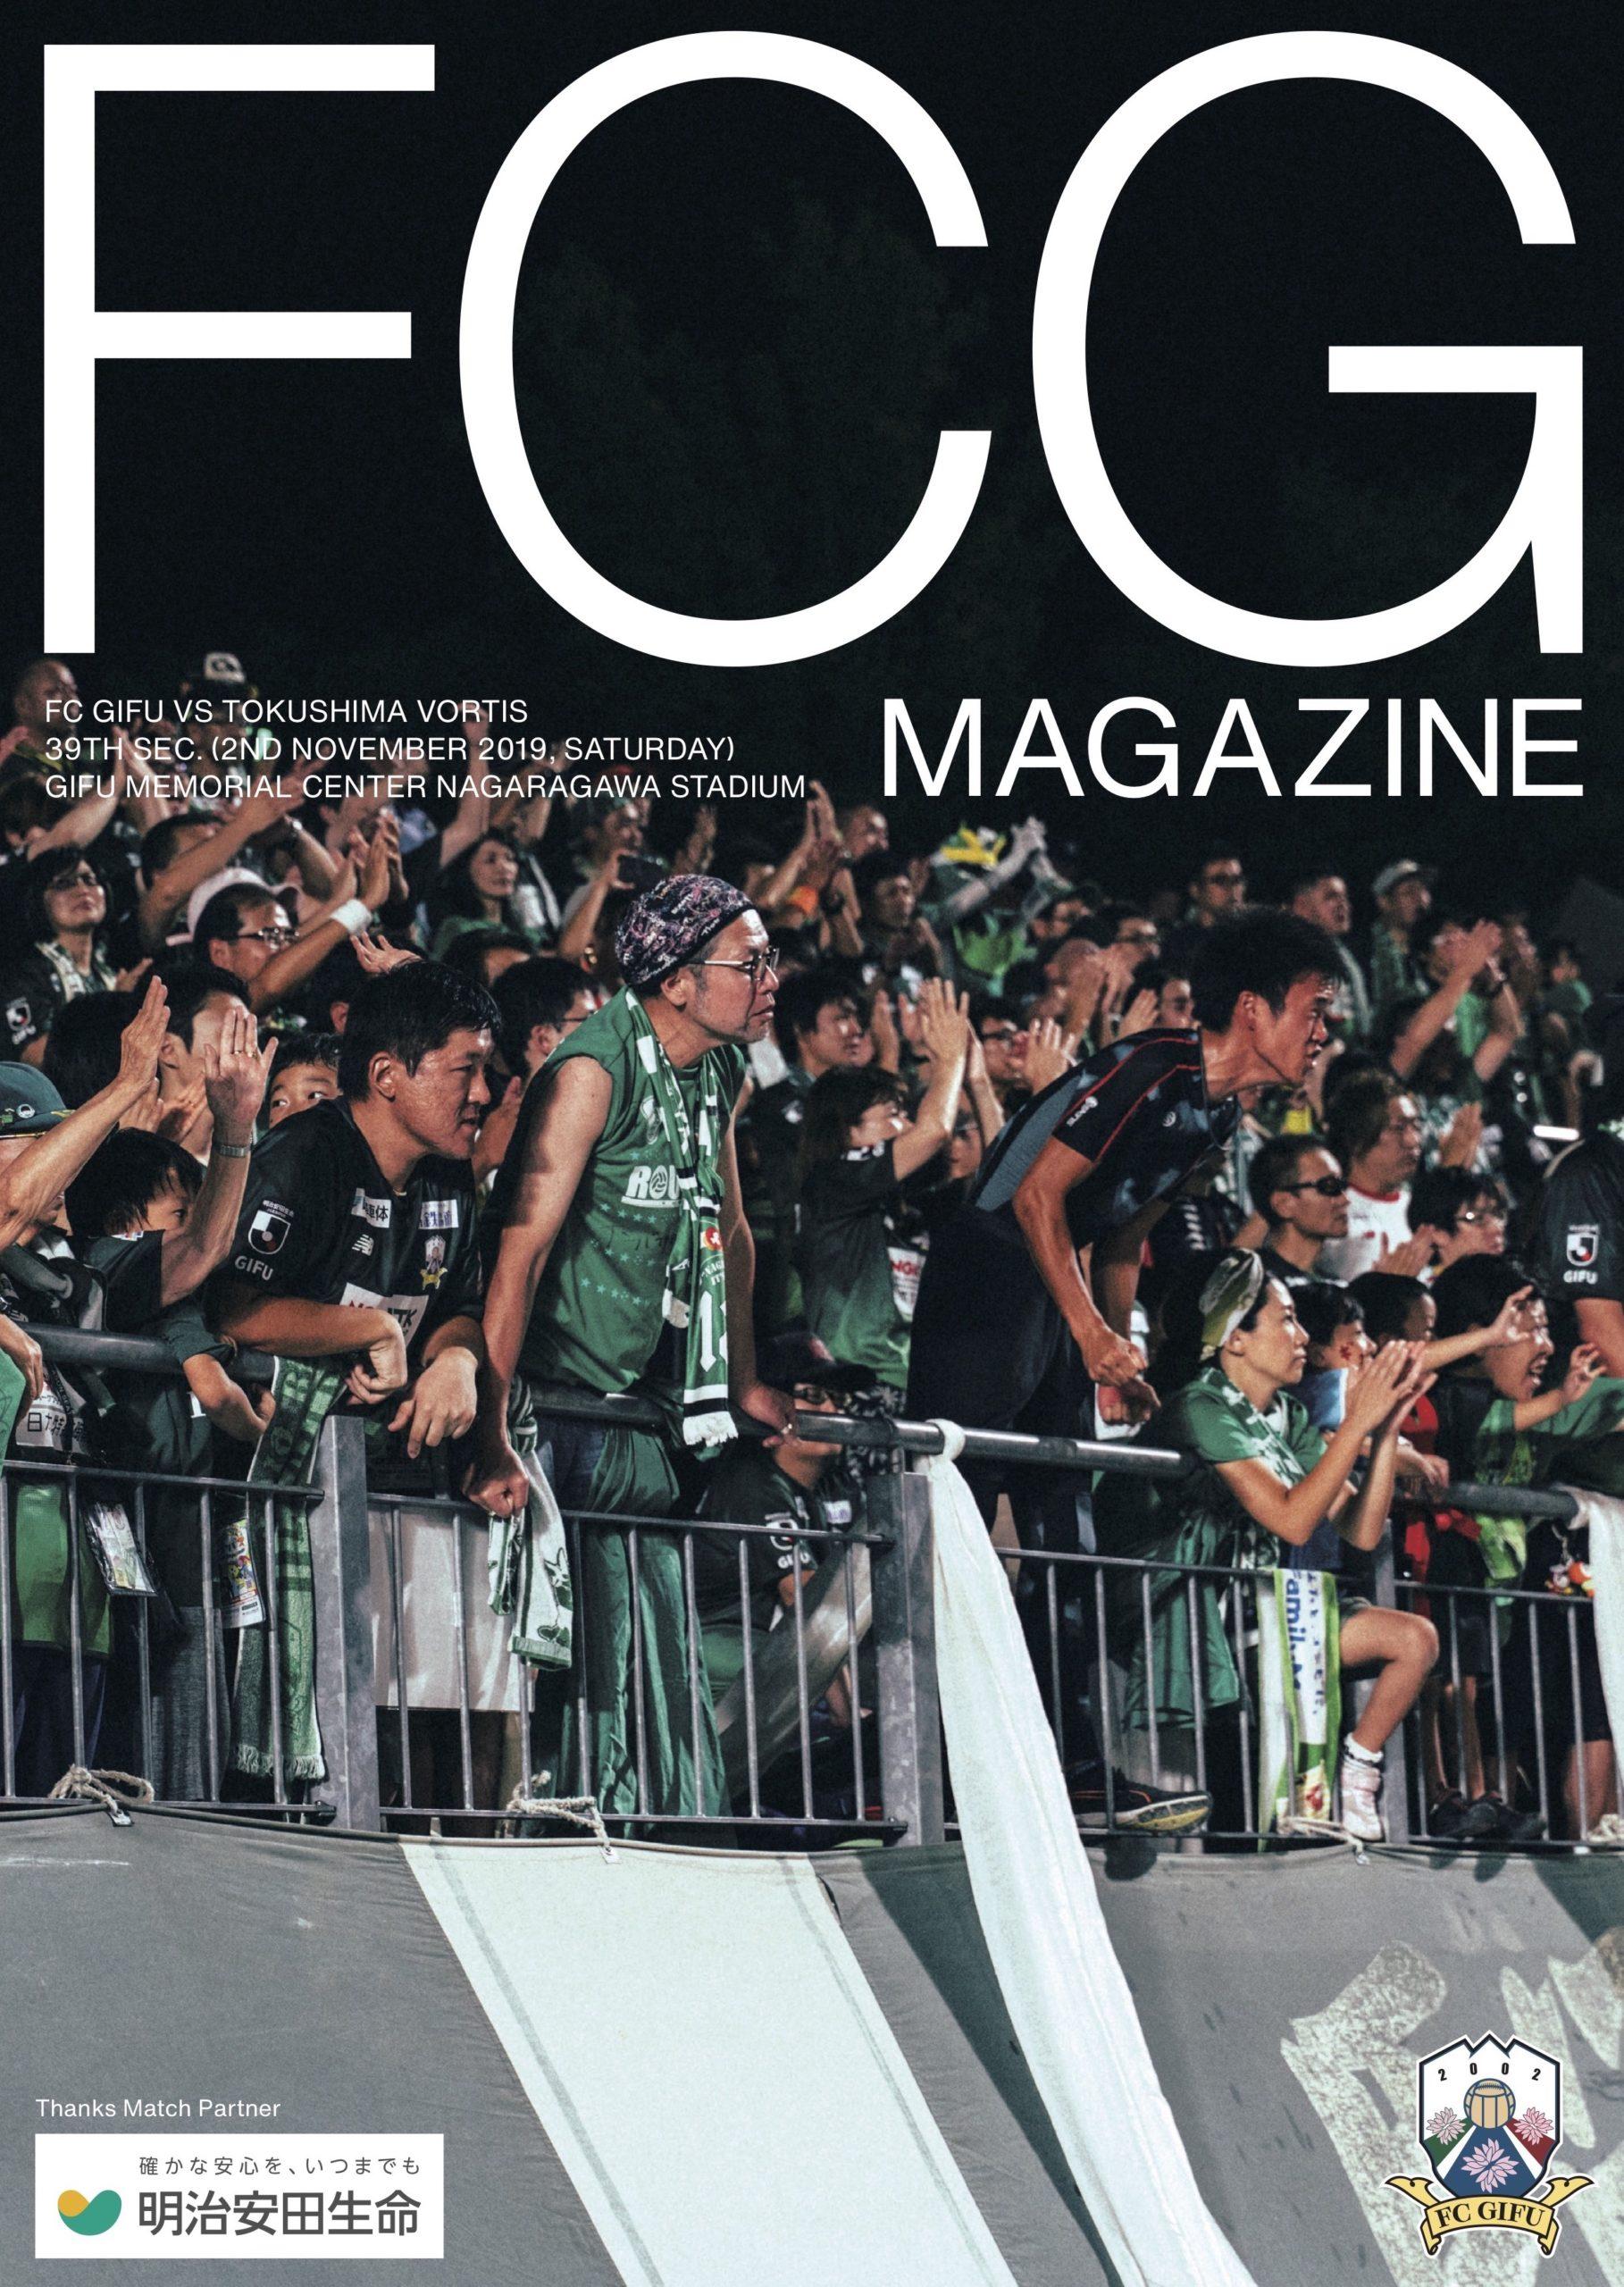 FCG Magazine